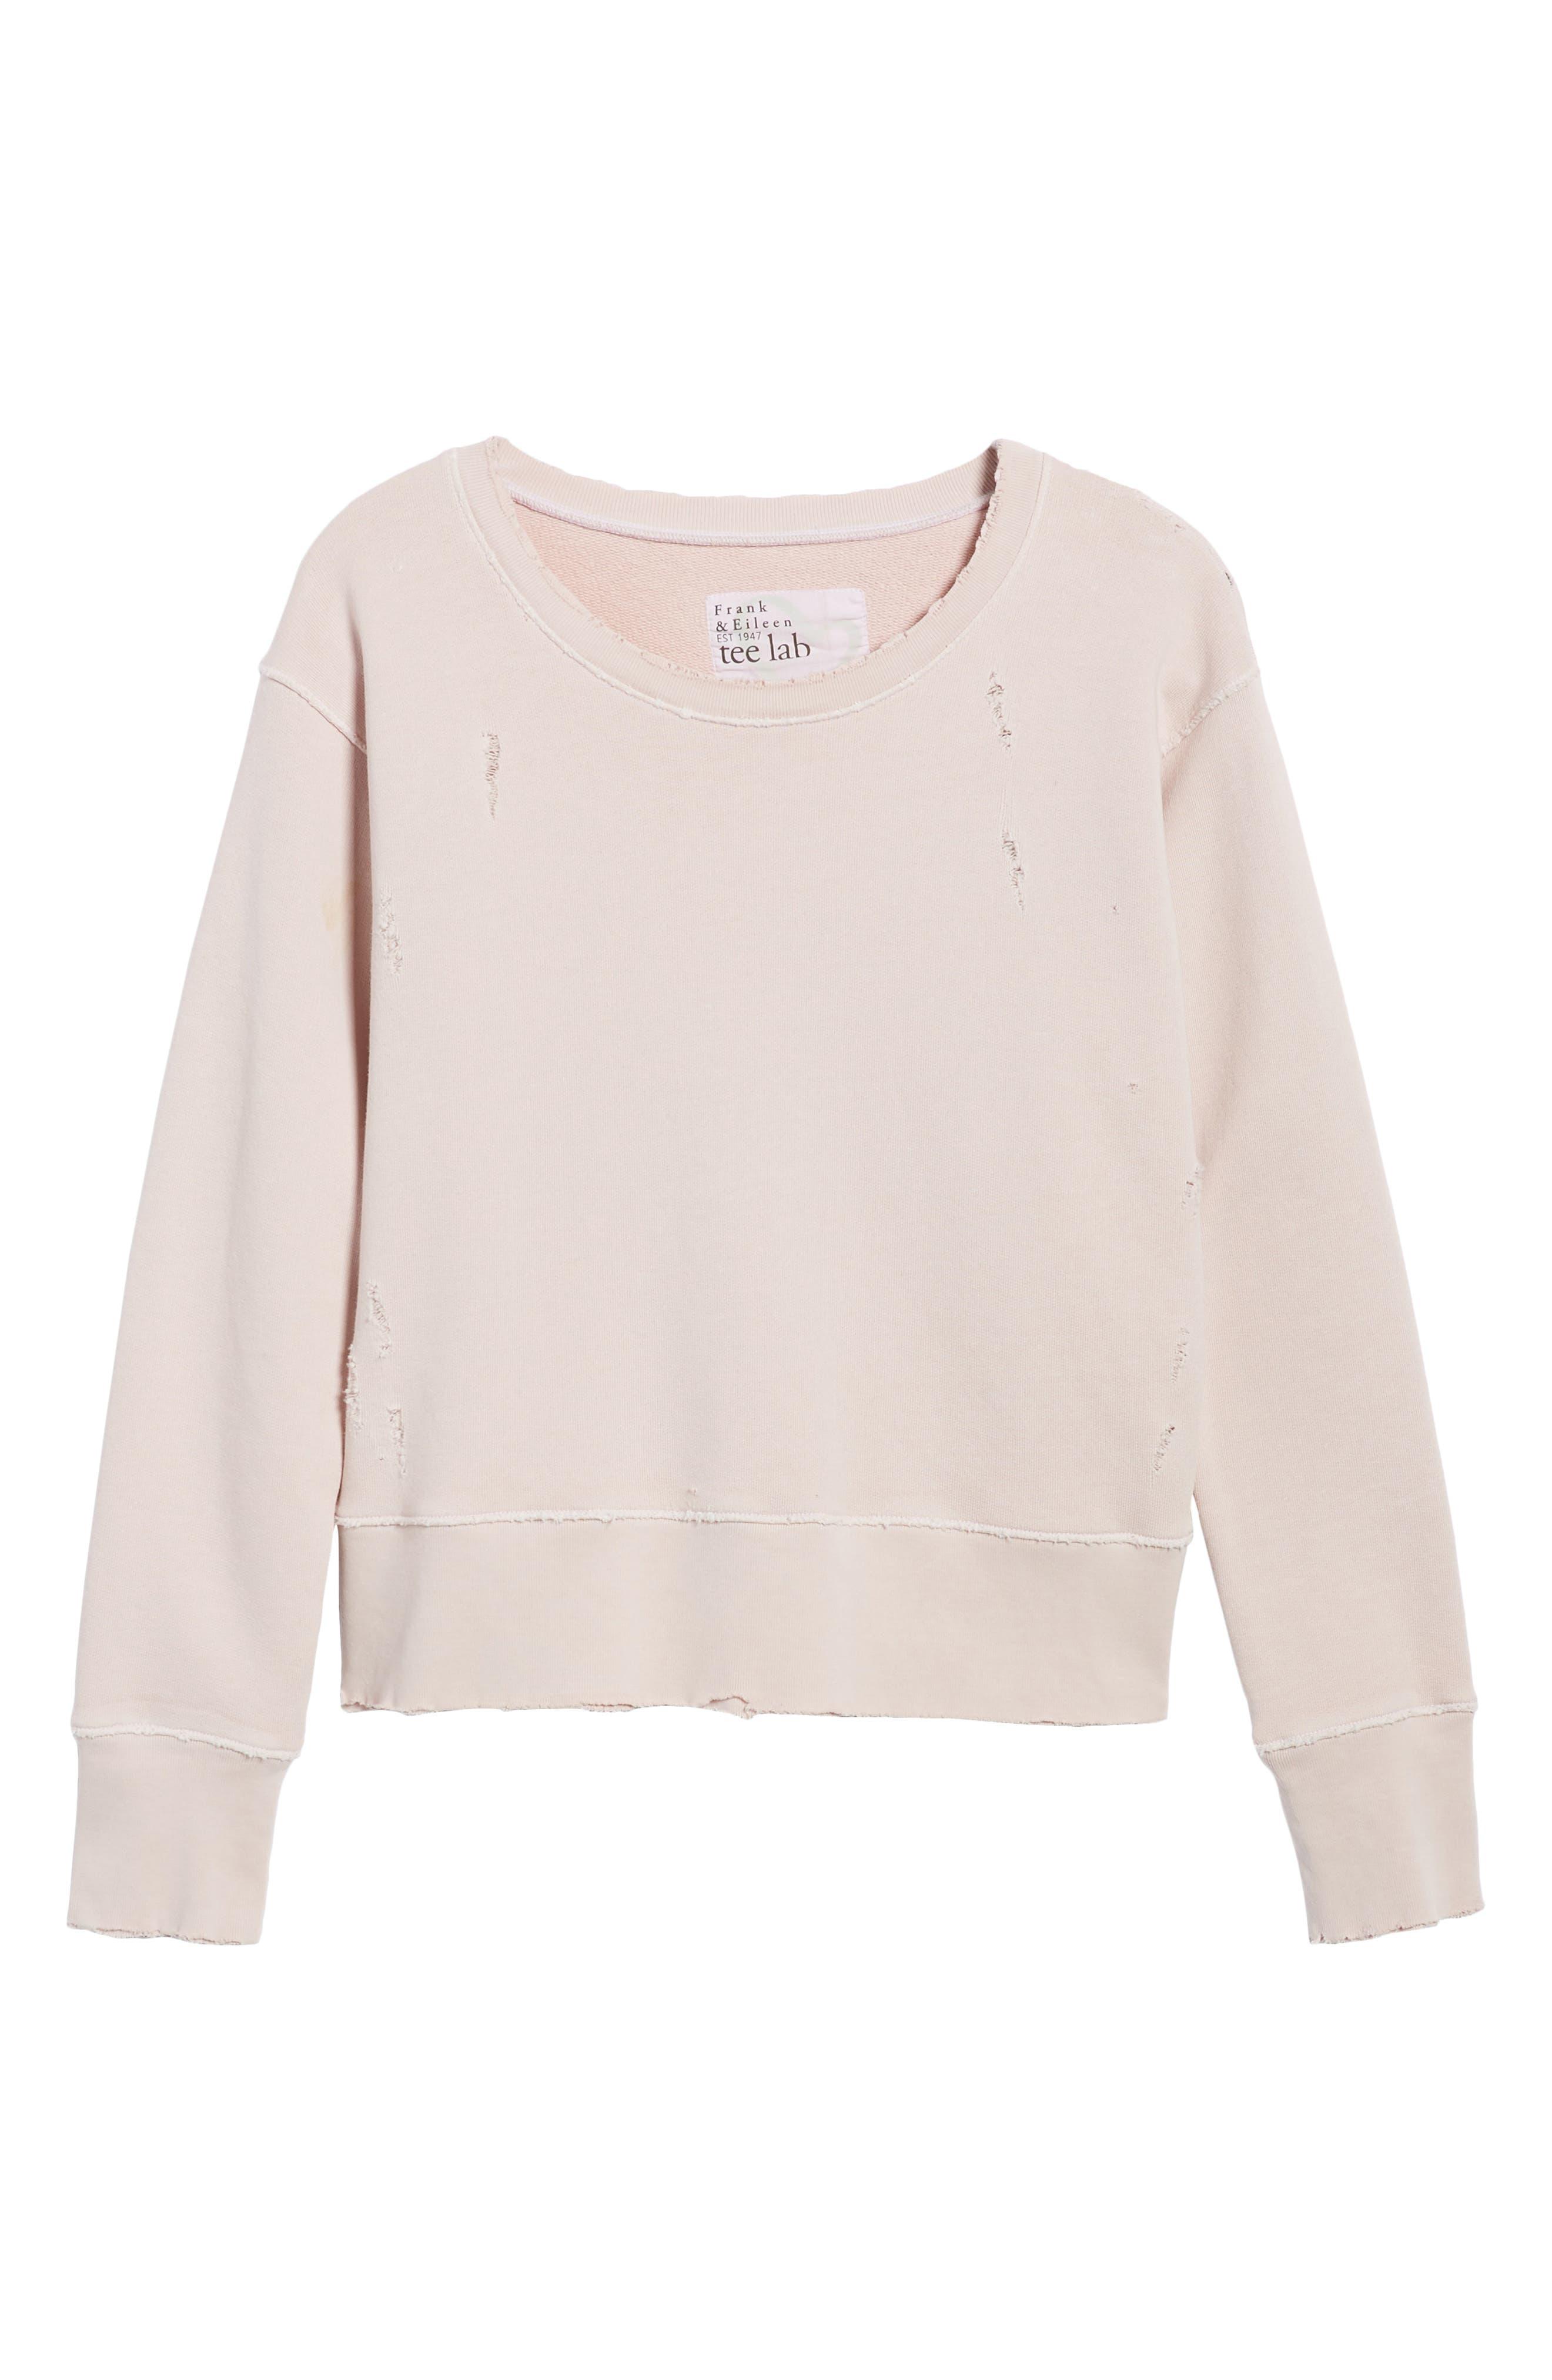 Tee Lab Cotton Sweatshirt,                             Alternate thumbnail 6, color,                             Bazooka 10 Year Vintage Wash